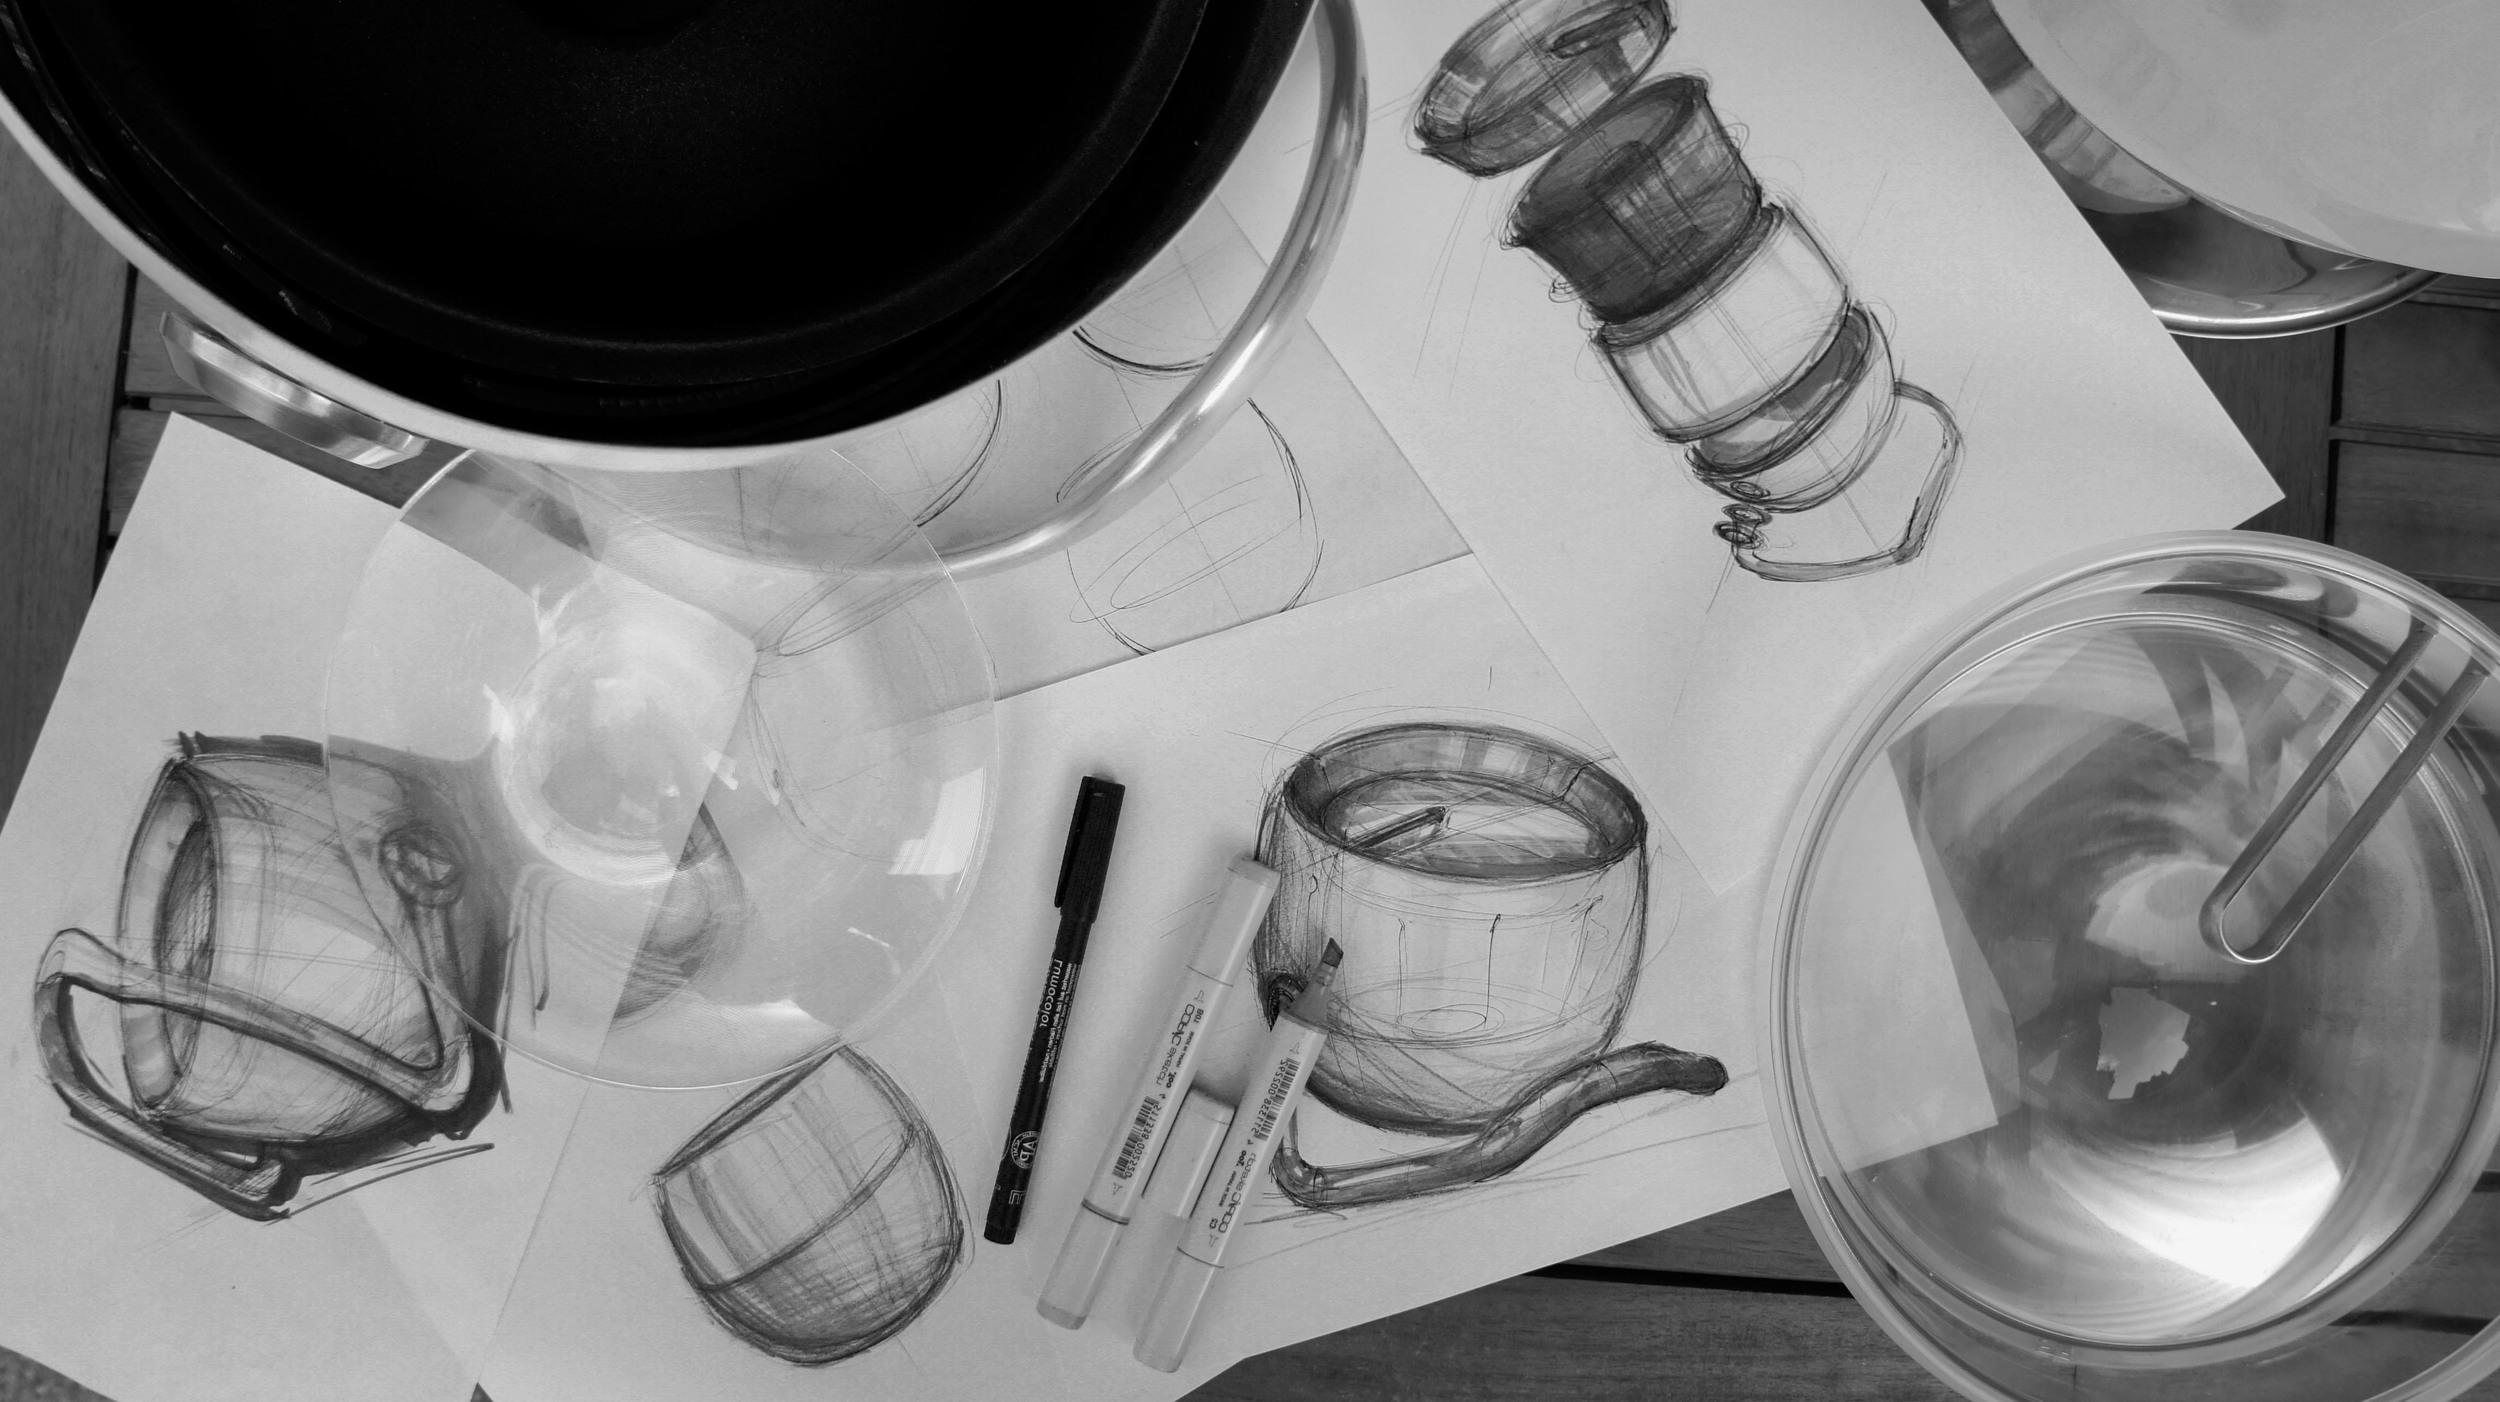 Solari - Press - The Designers Dilemma